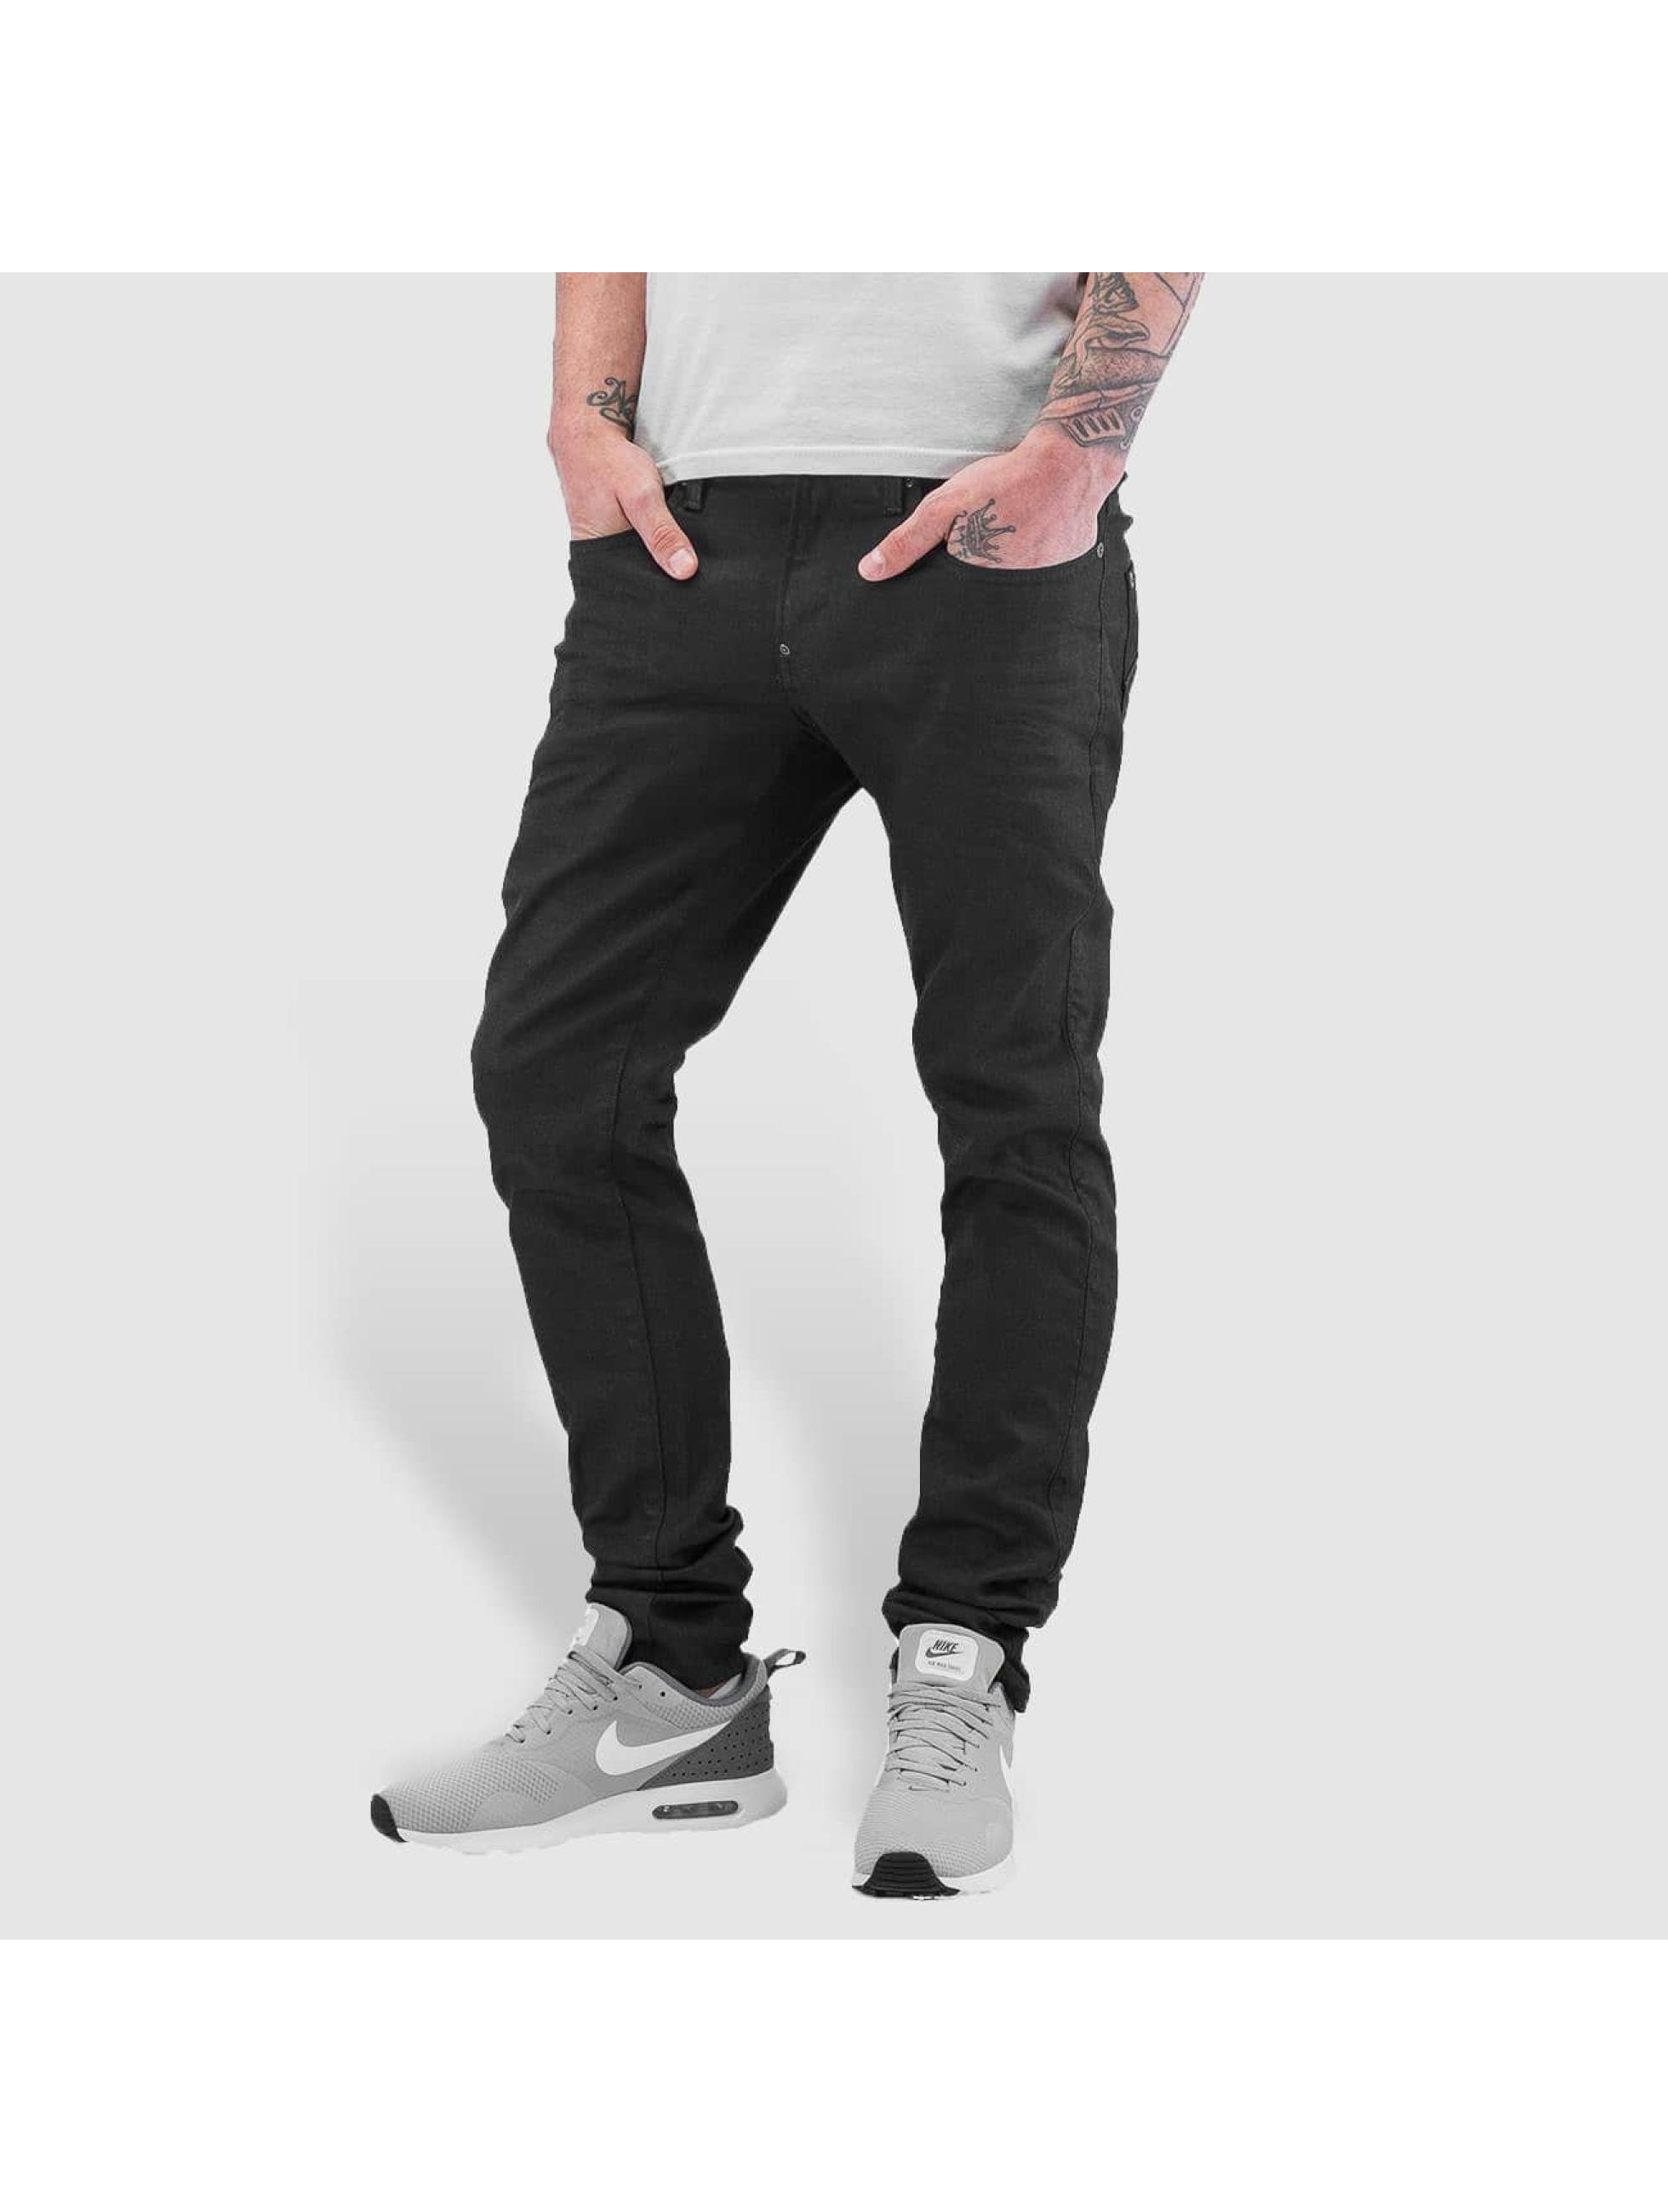 G-Star Slim Fit Jeans Revend schwarz